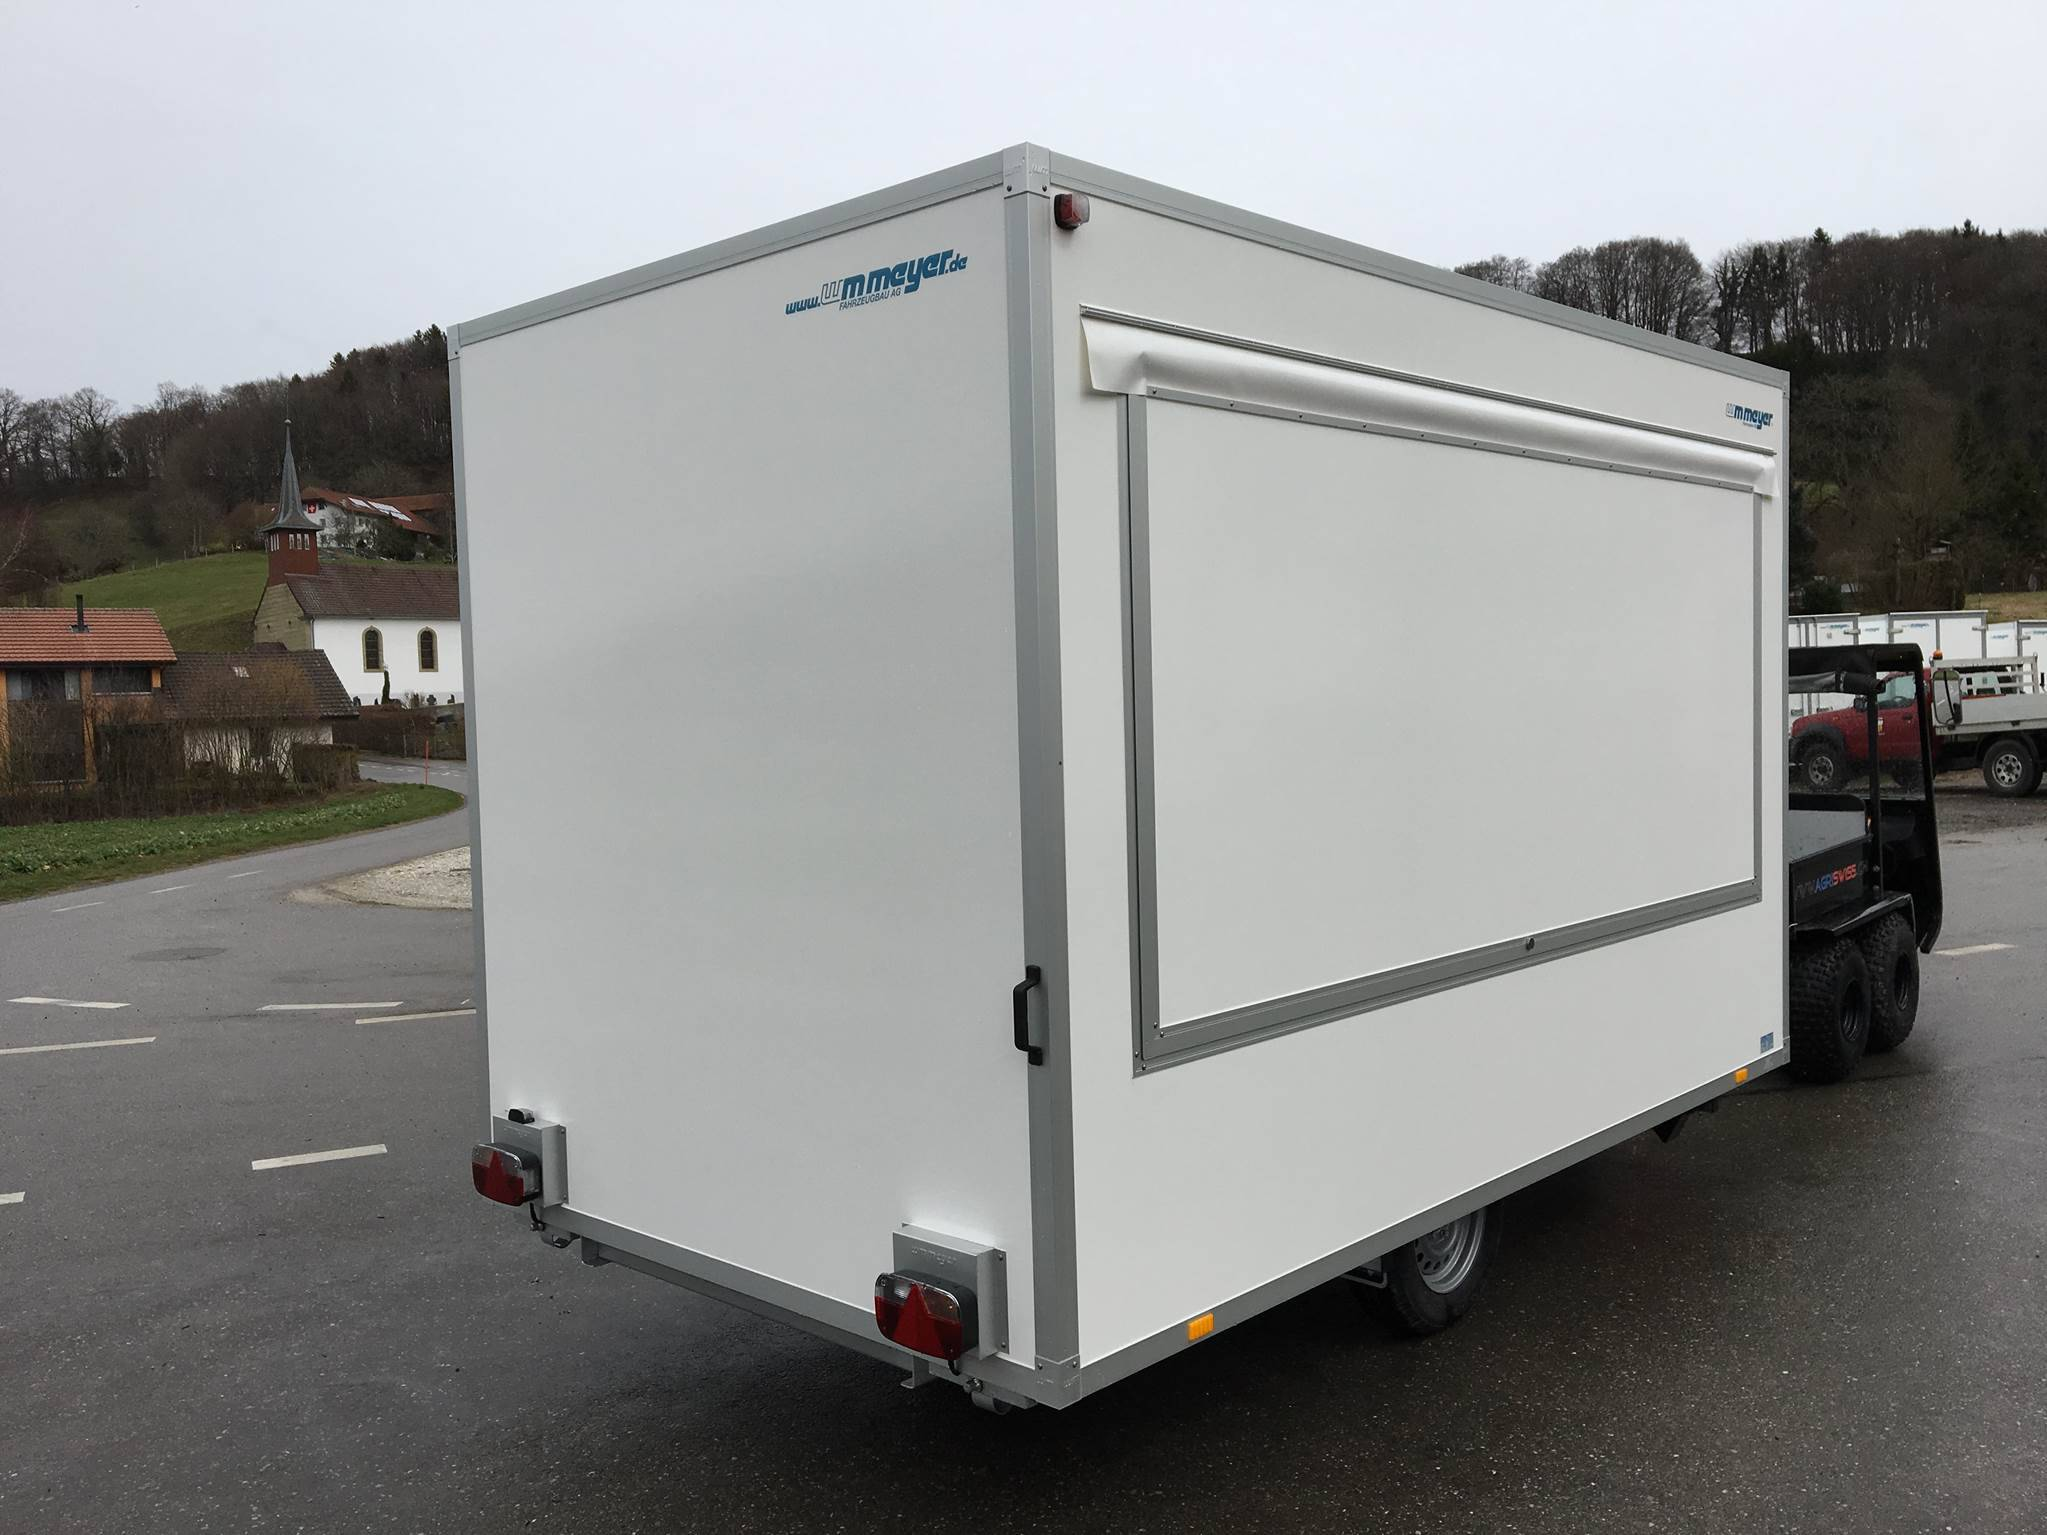 remorque de vente wm meyer vke 1337 206 food truck. Black Bedroom Furniture Sets. Home Design Ideas